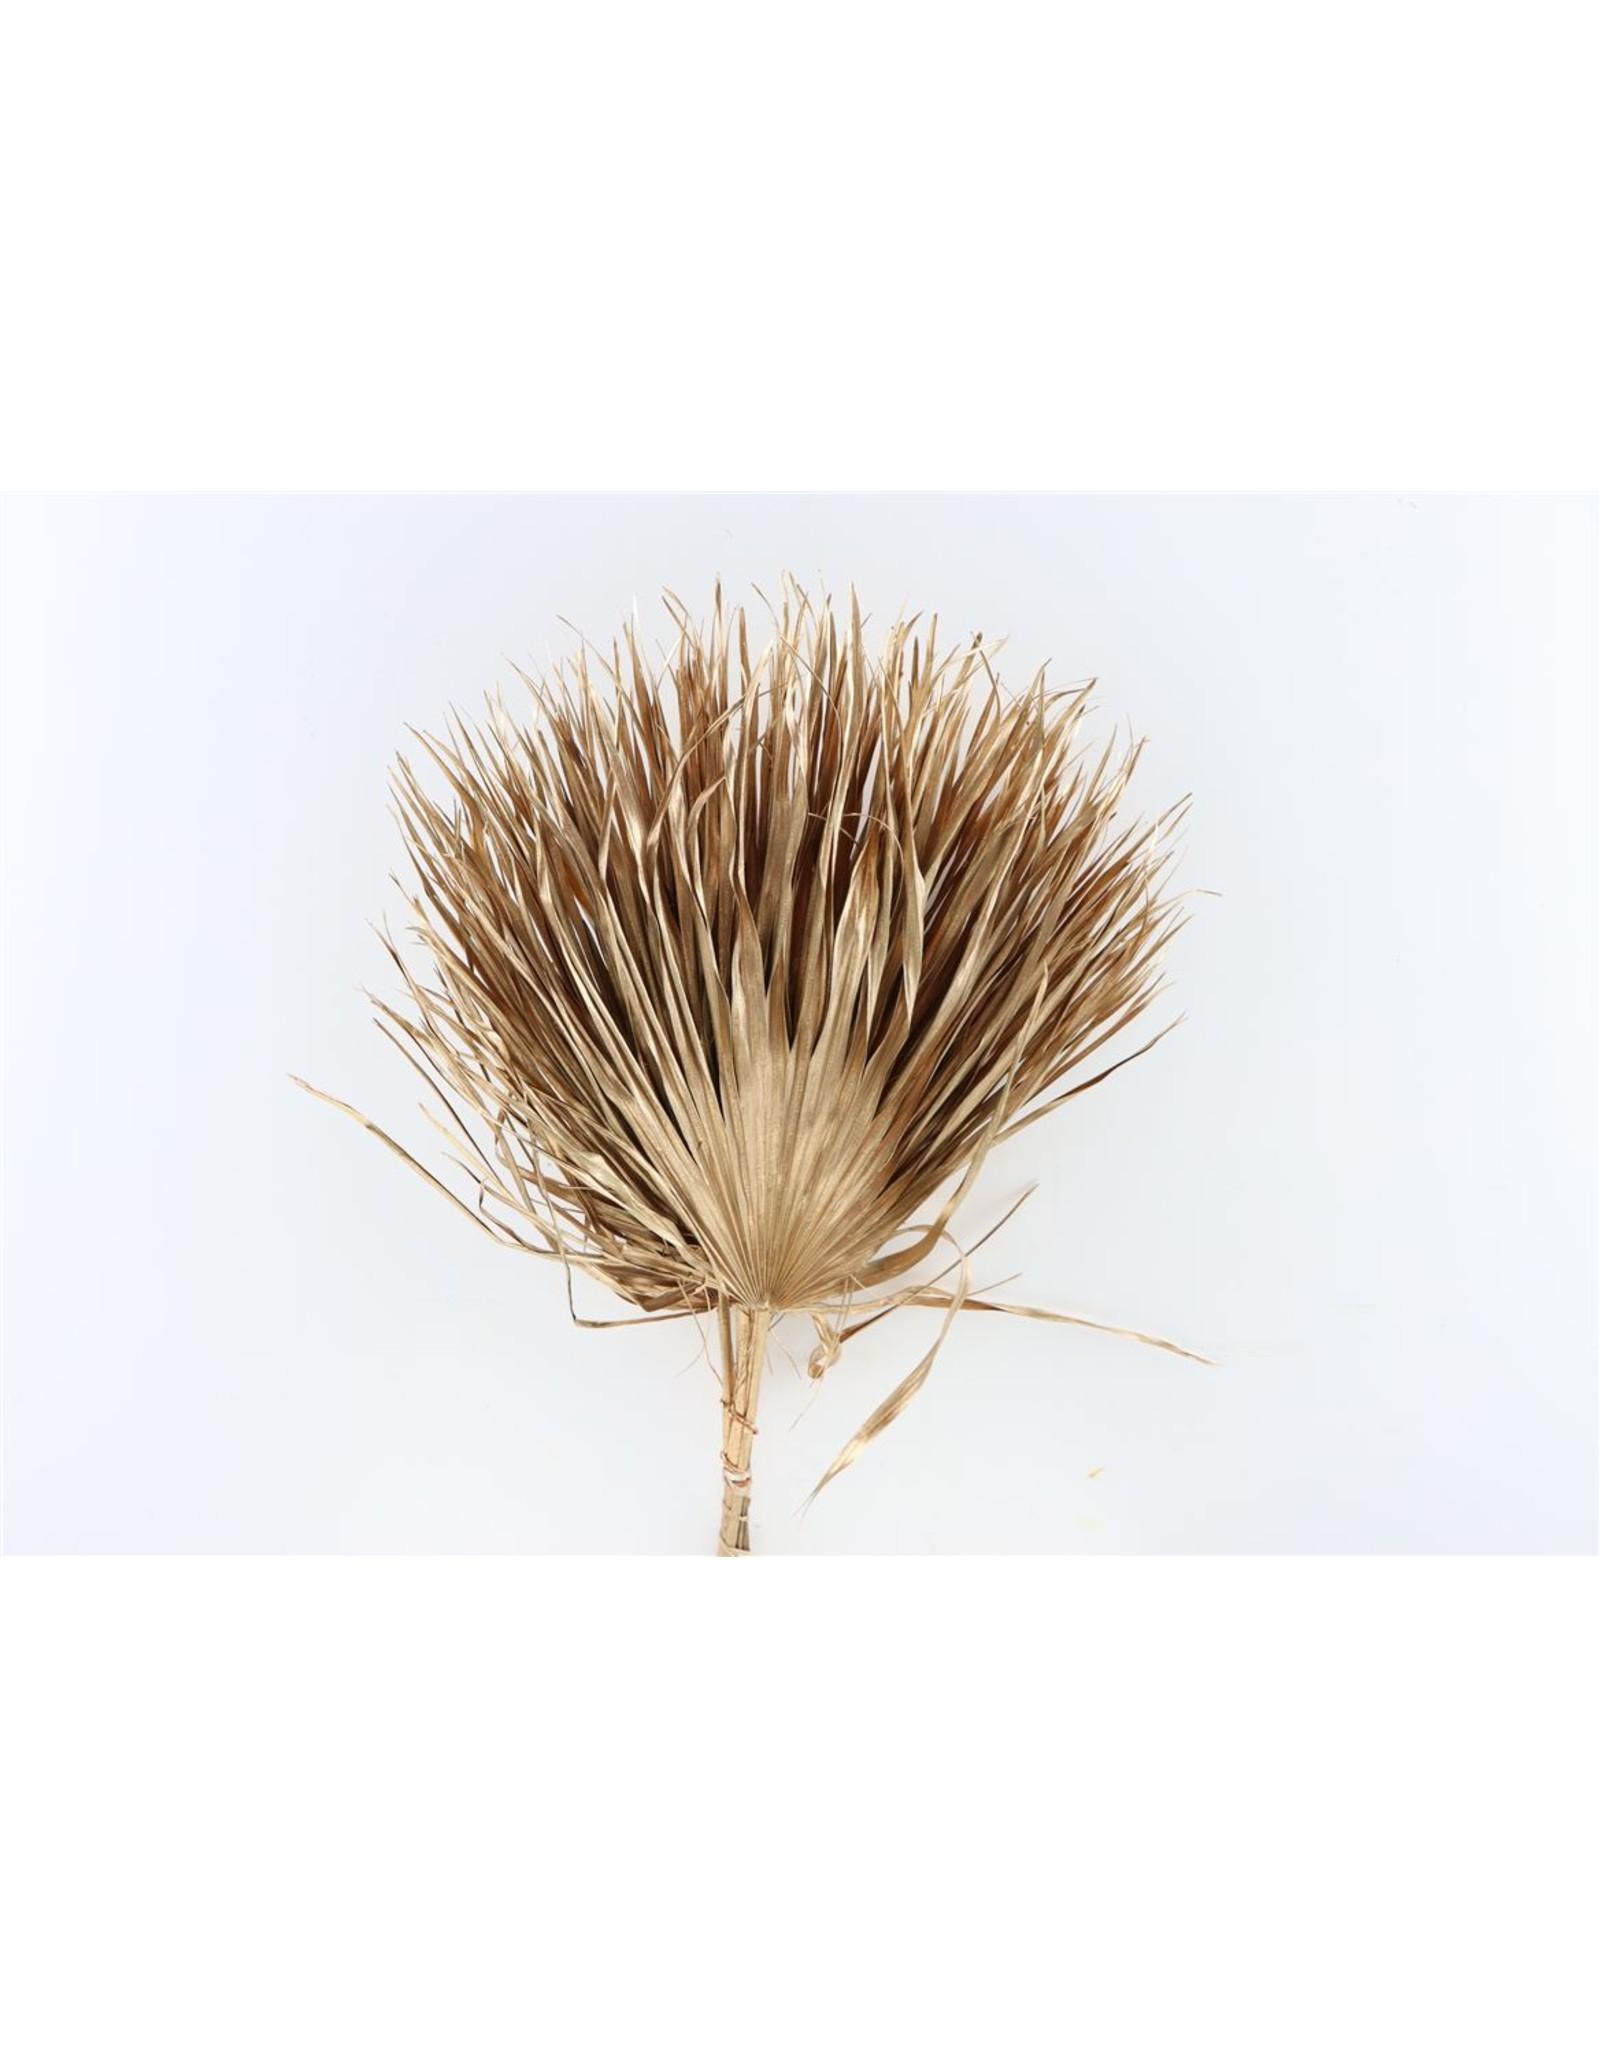 Dried Chamaerops (10tk) Oud Goud Bunch x 1